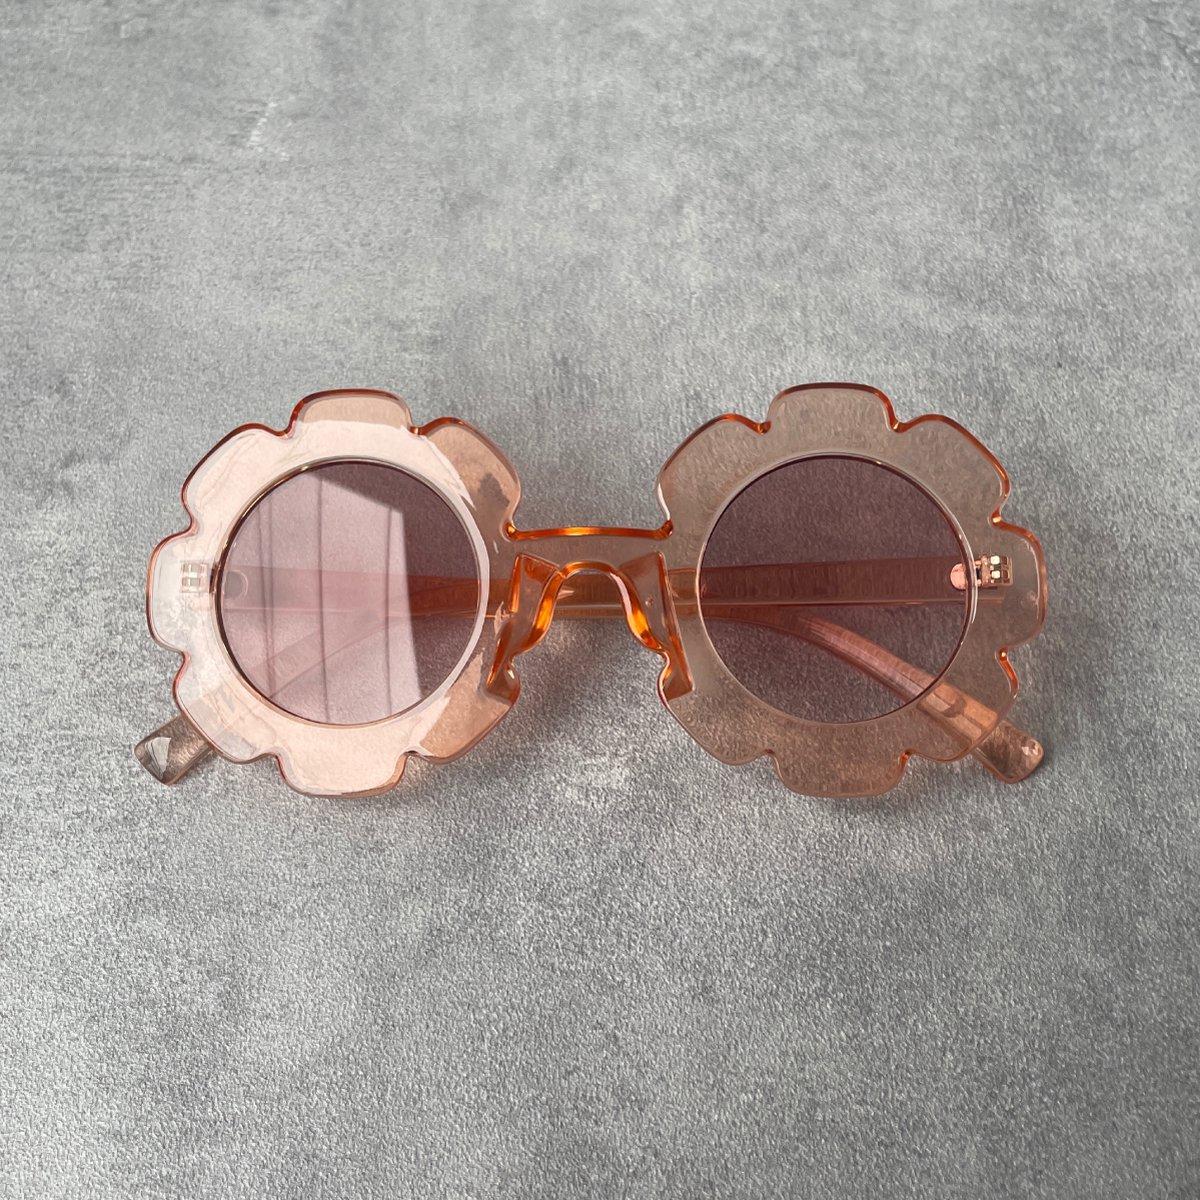 【KIDS】Kids Flower Sunglasses 詳細画像4